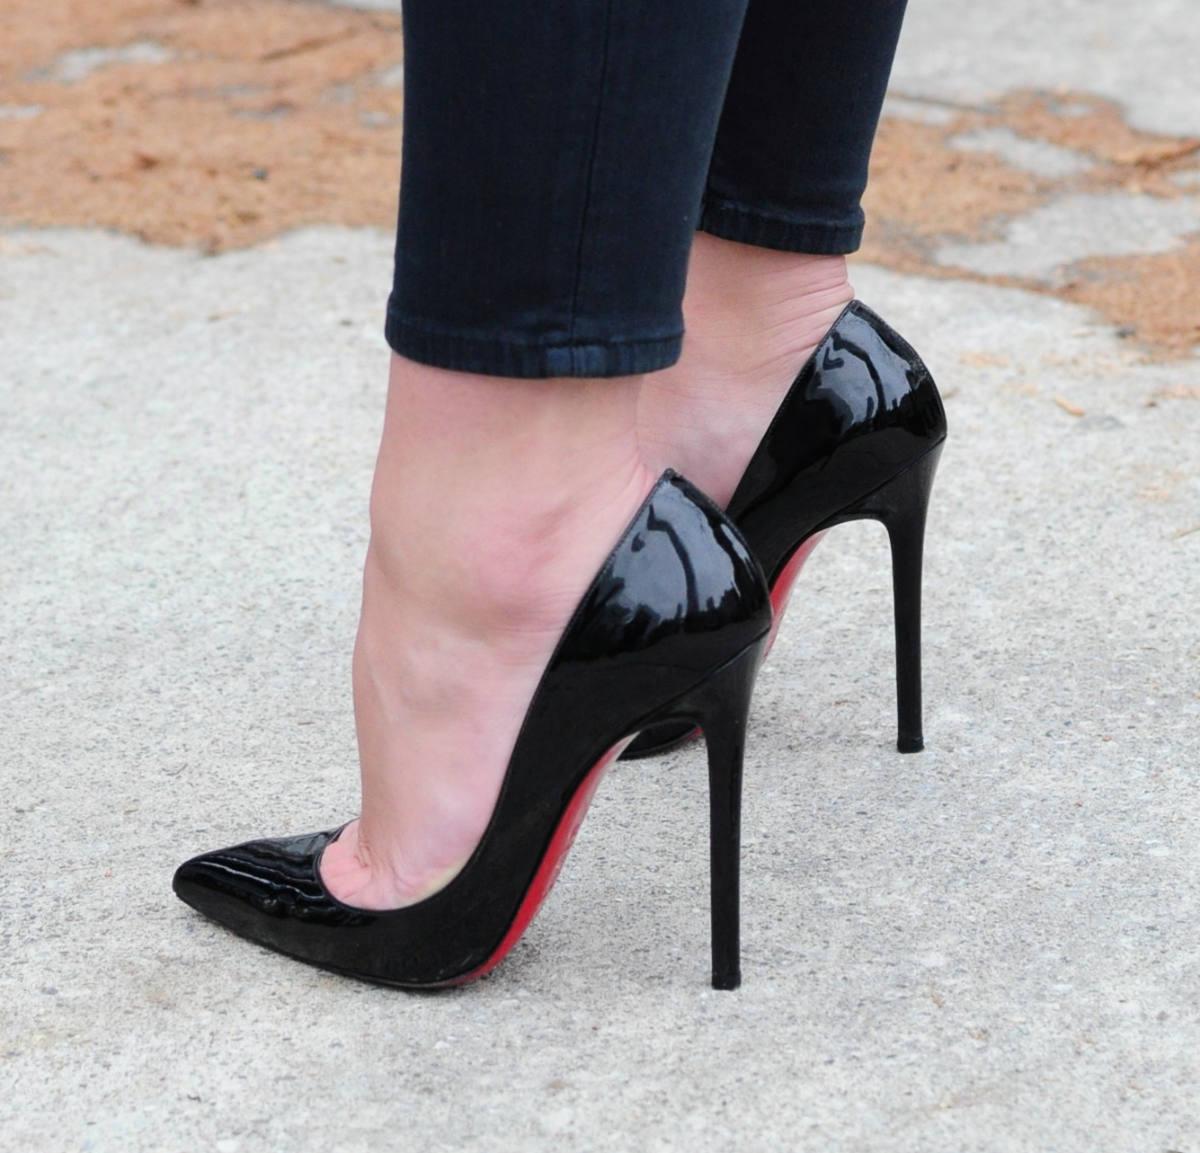 Woman wearing black patent stiletto heels   What are stilettos heels by ShoeTease.